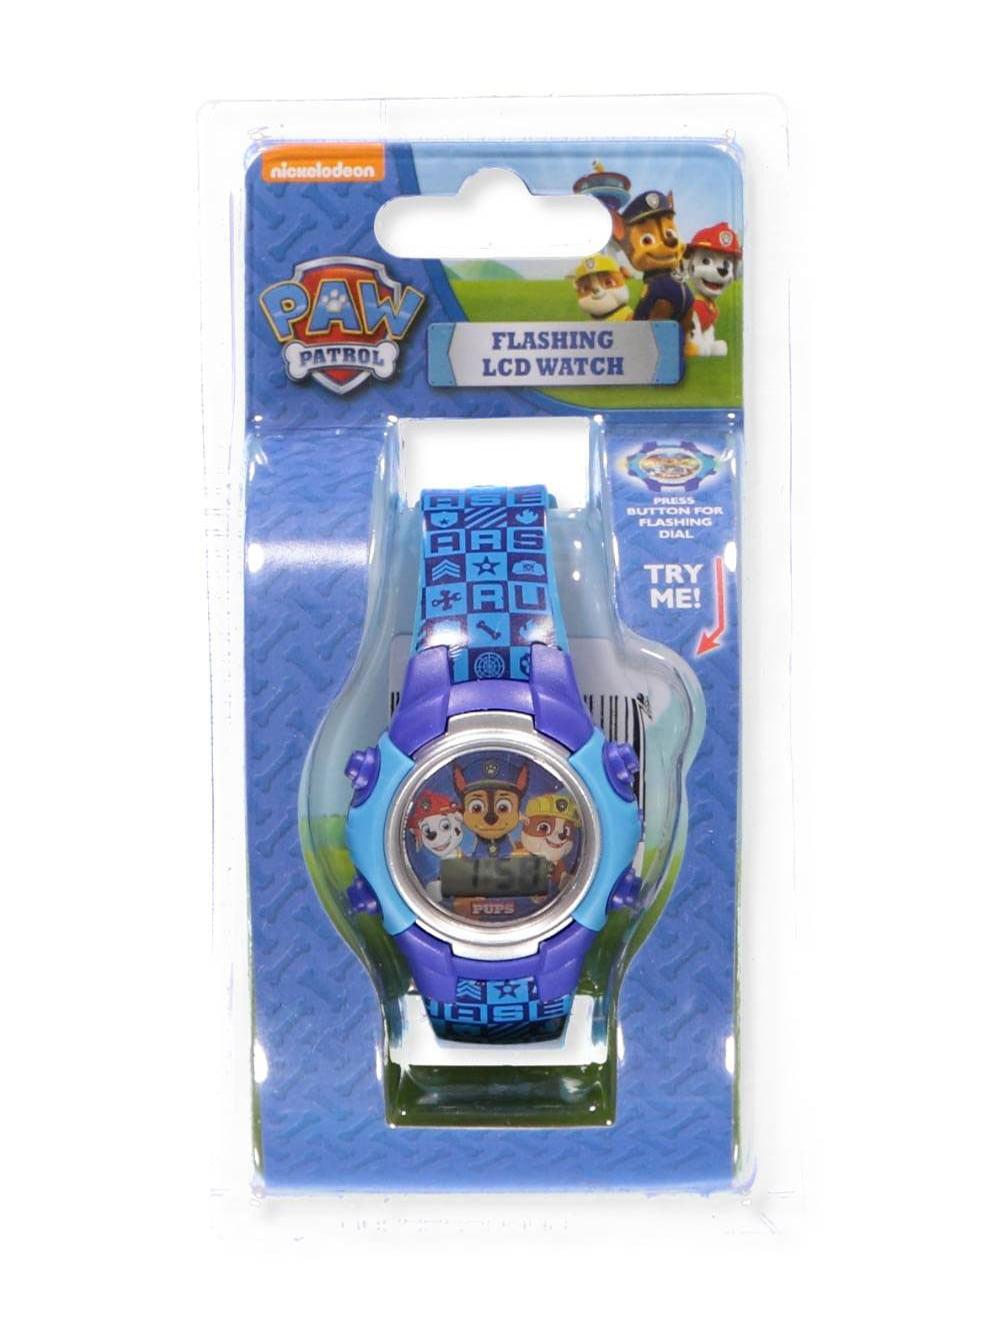 Paw Patrol Flashing LCD Watch